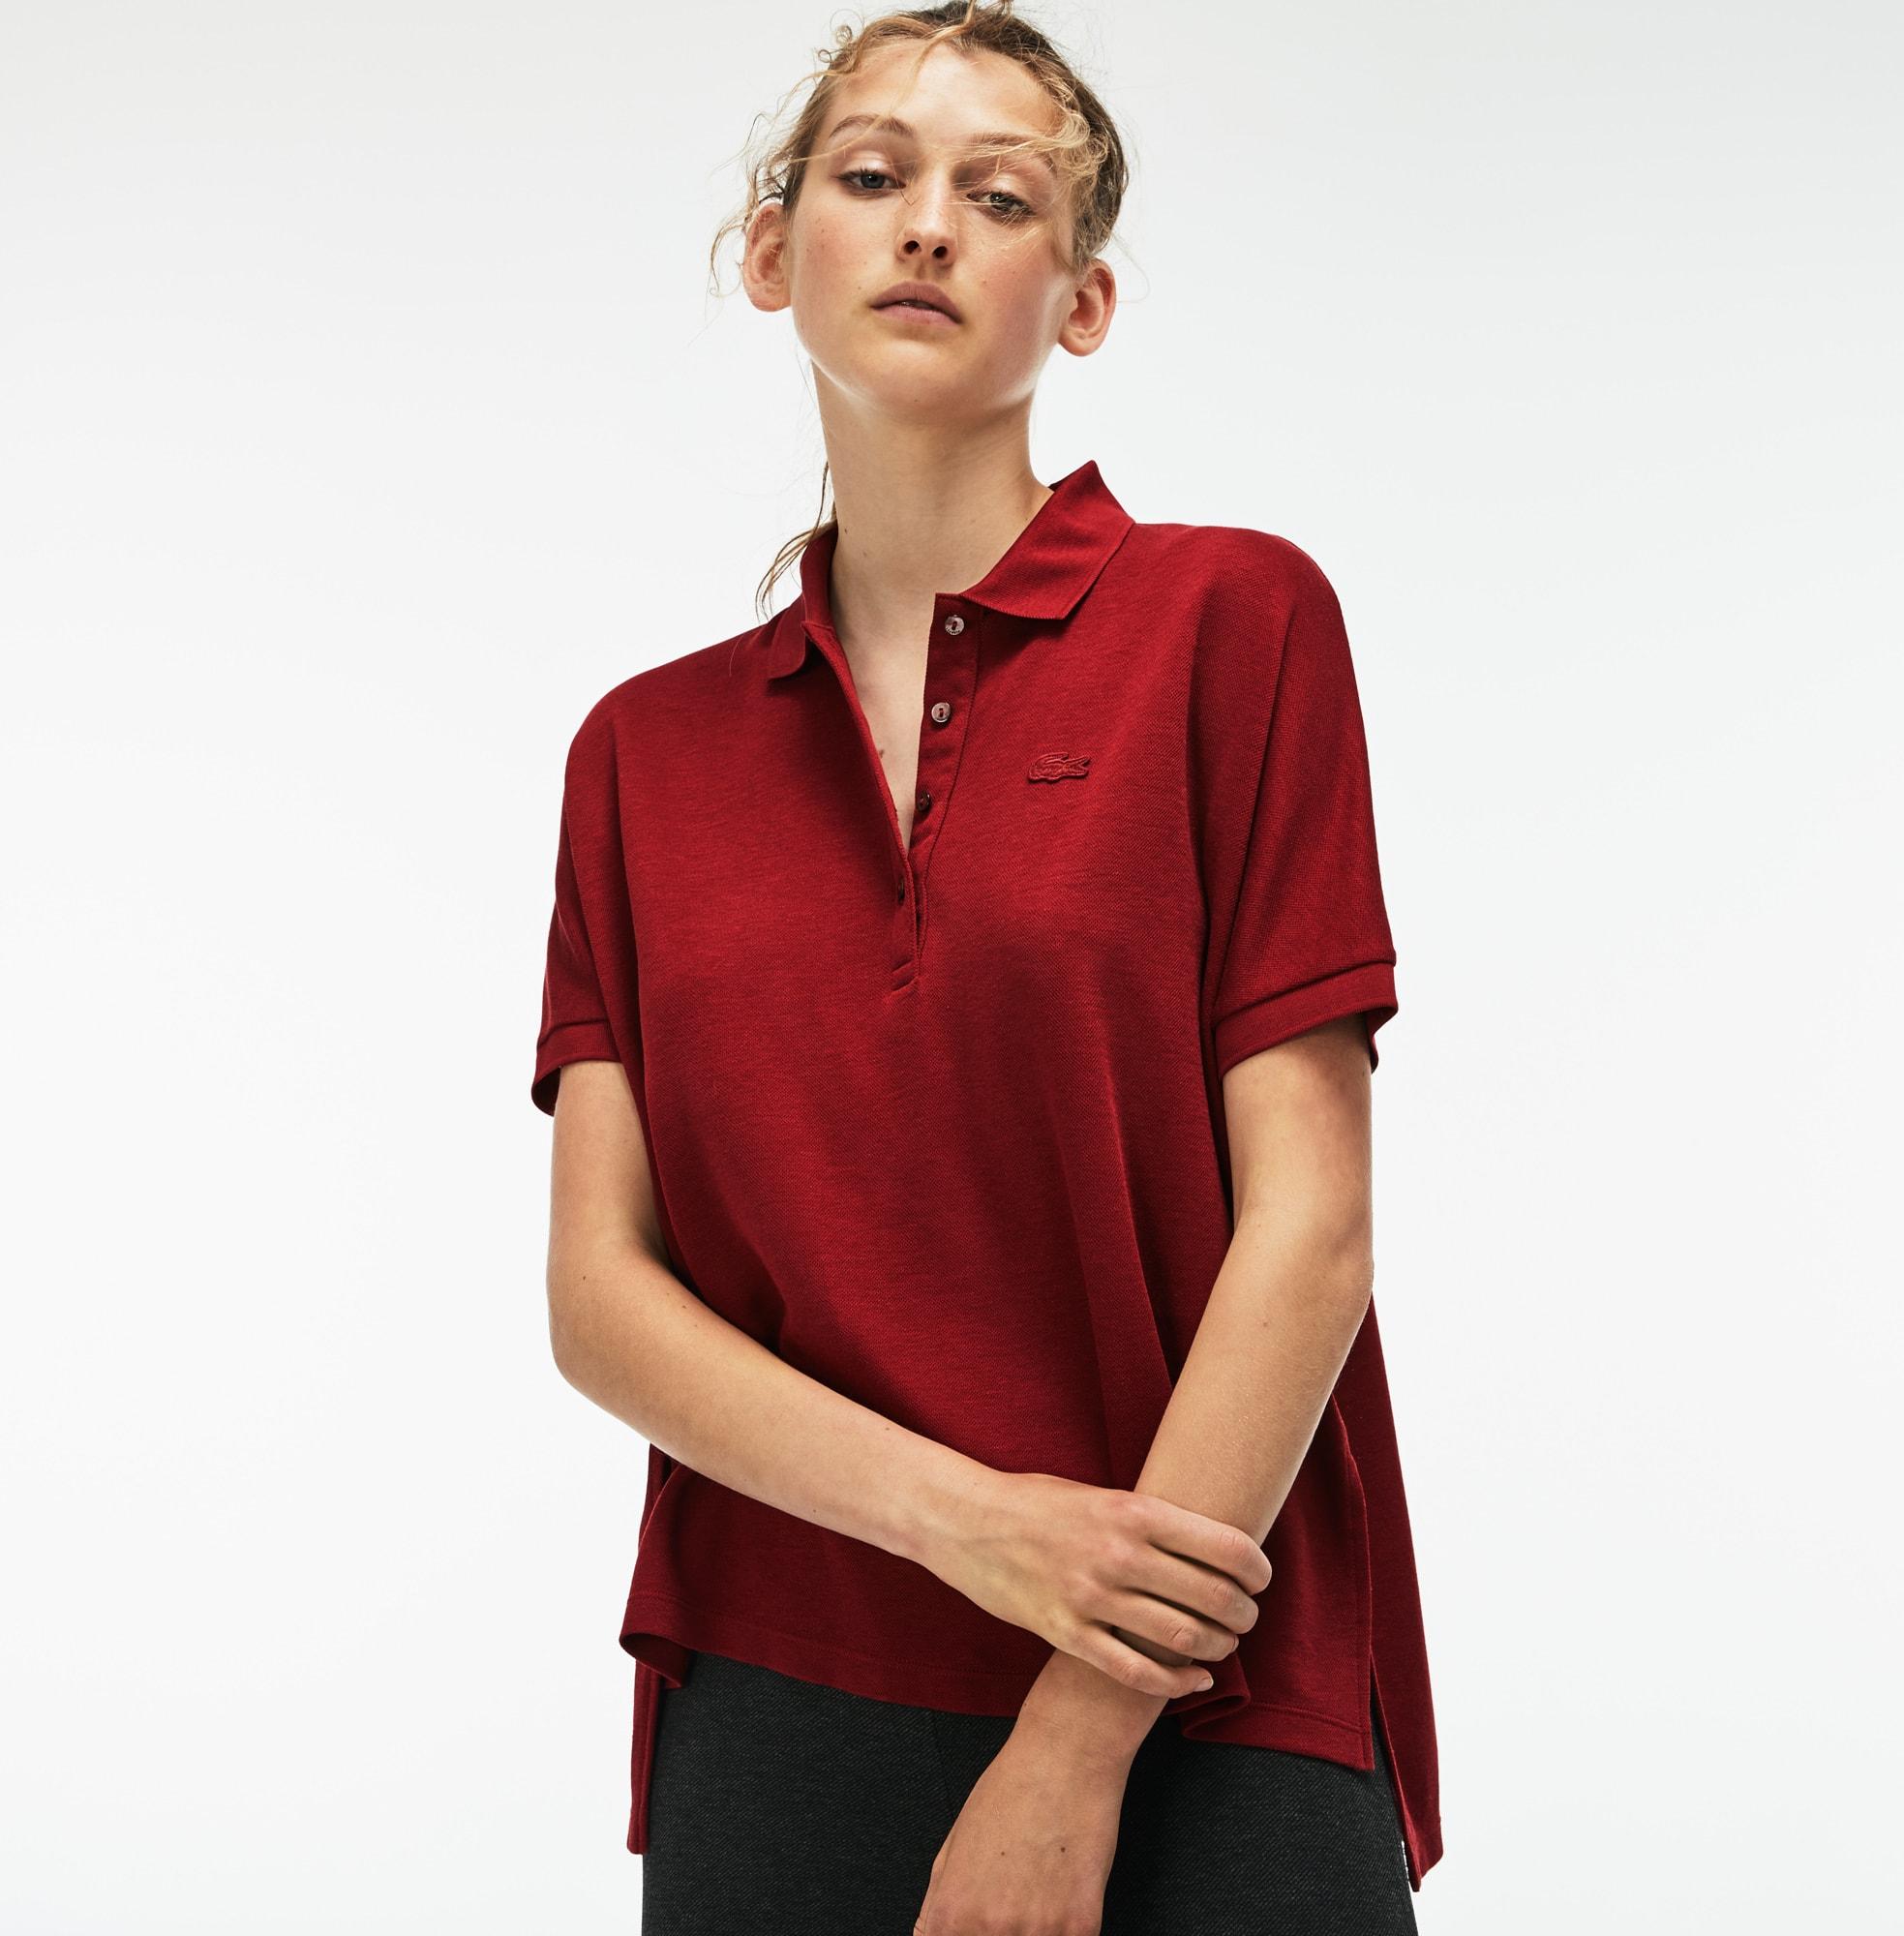 Soft Polo De Mujer Relax Fit En Piqué De Algodón Elástico Fluido